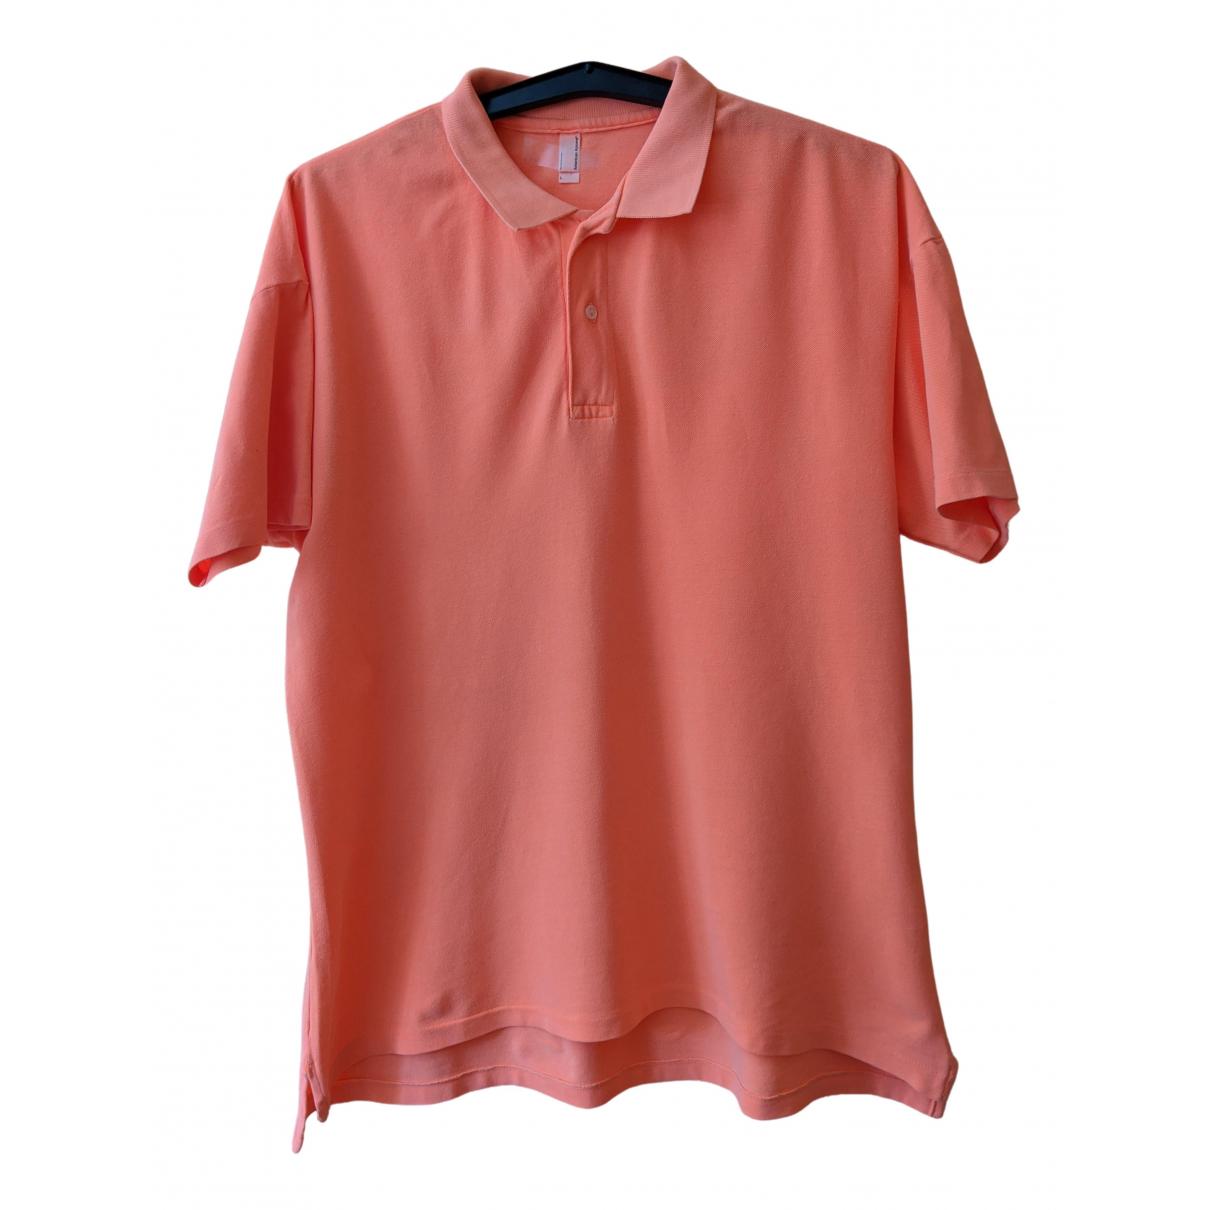 American Apparel - Polos   pour homme en coton - orange